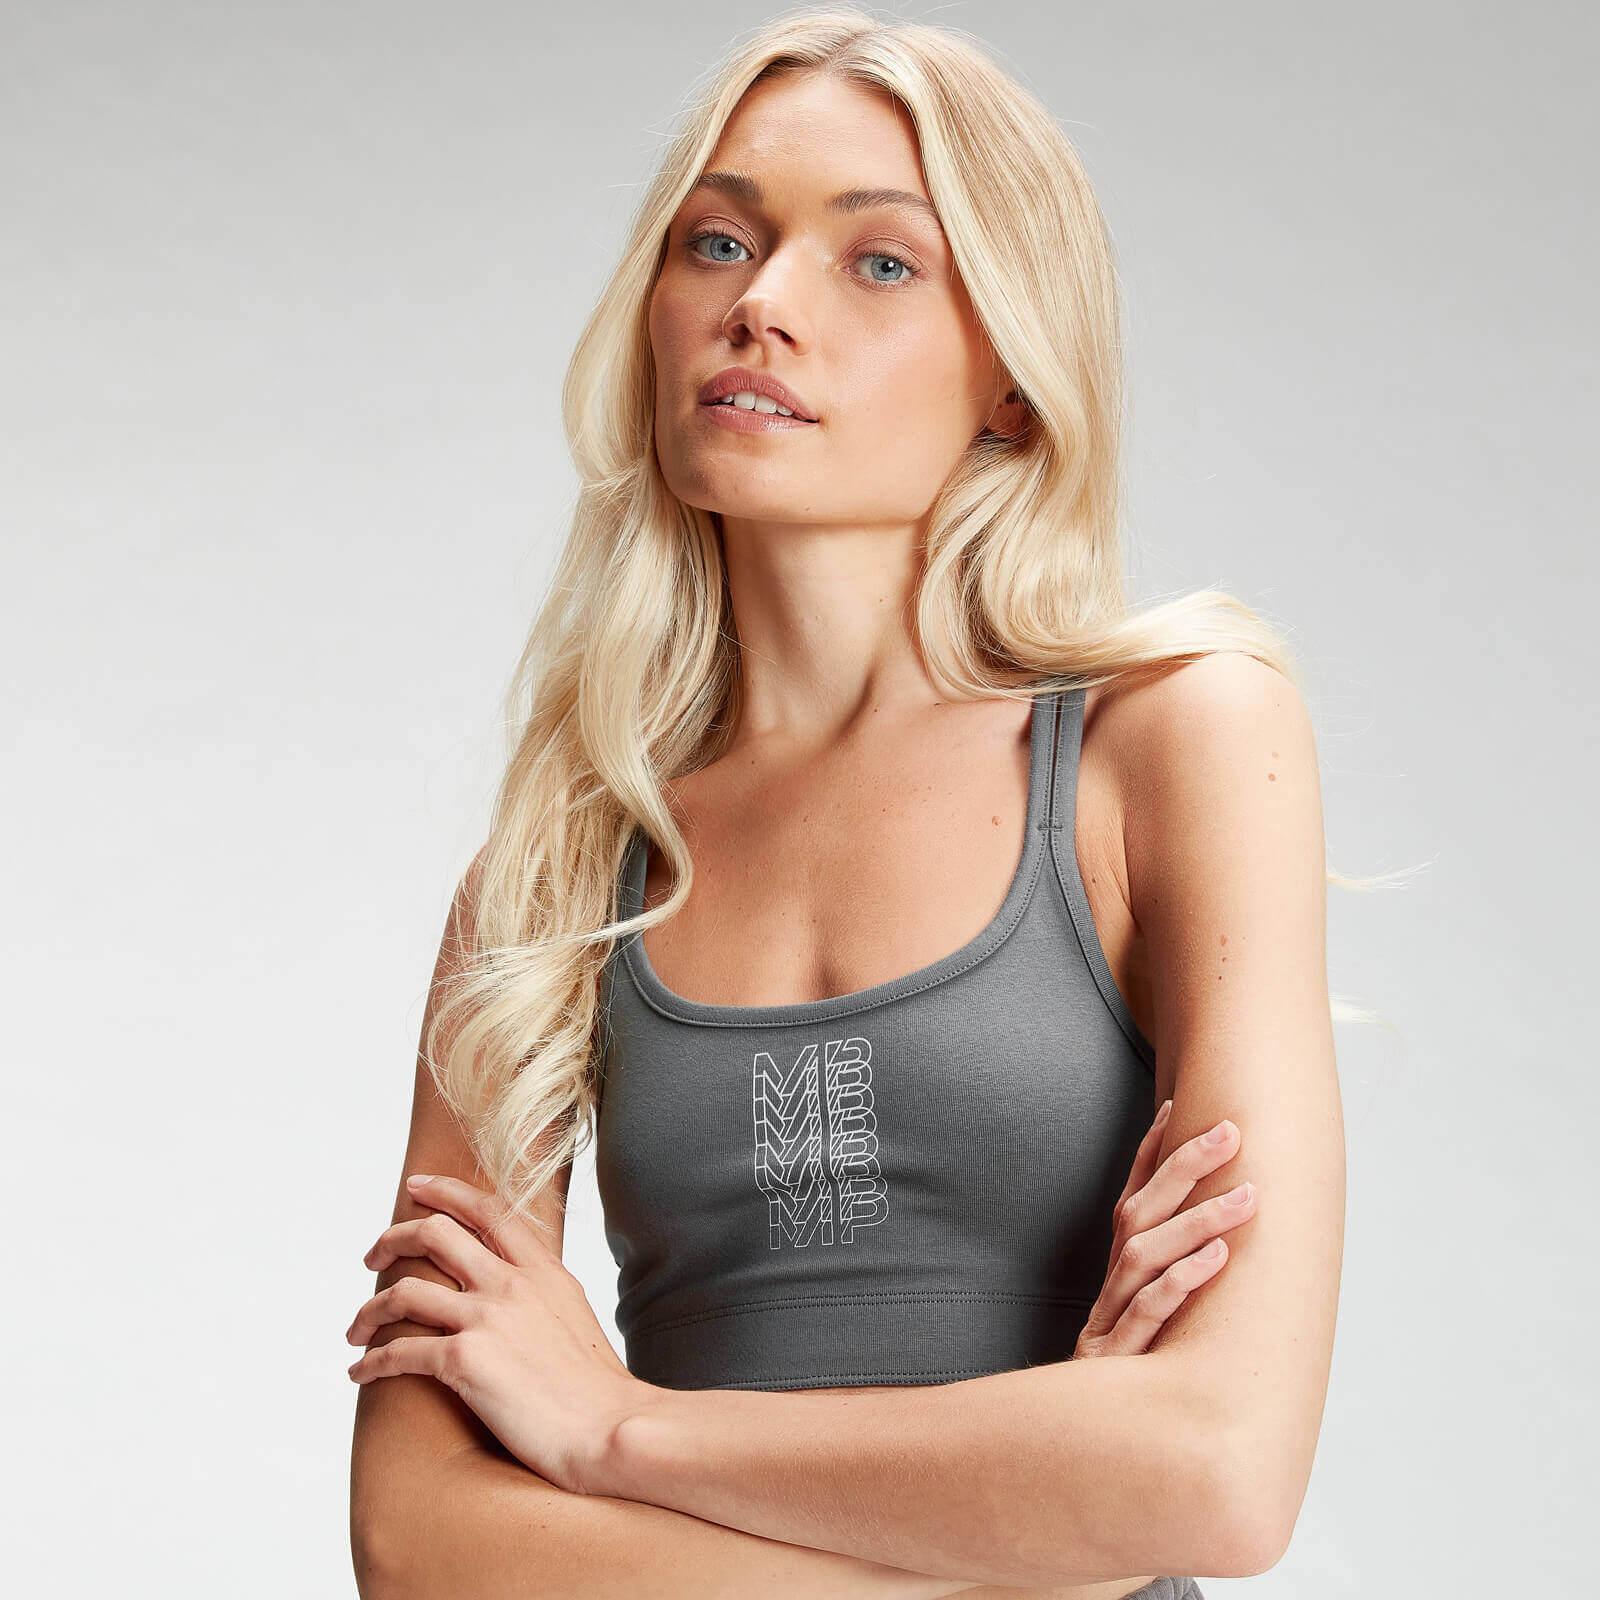 Купить MP Women's Repeat MP Sports Bra - Carbon - XXL, Myprotein International